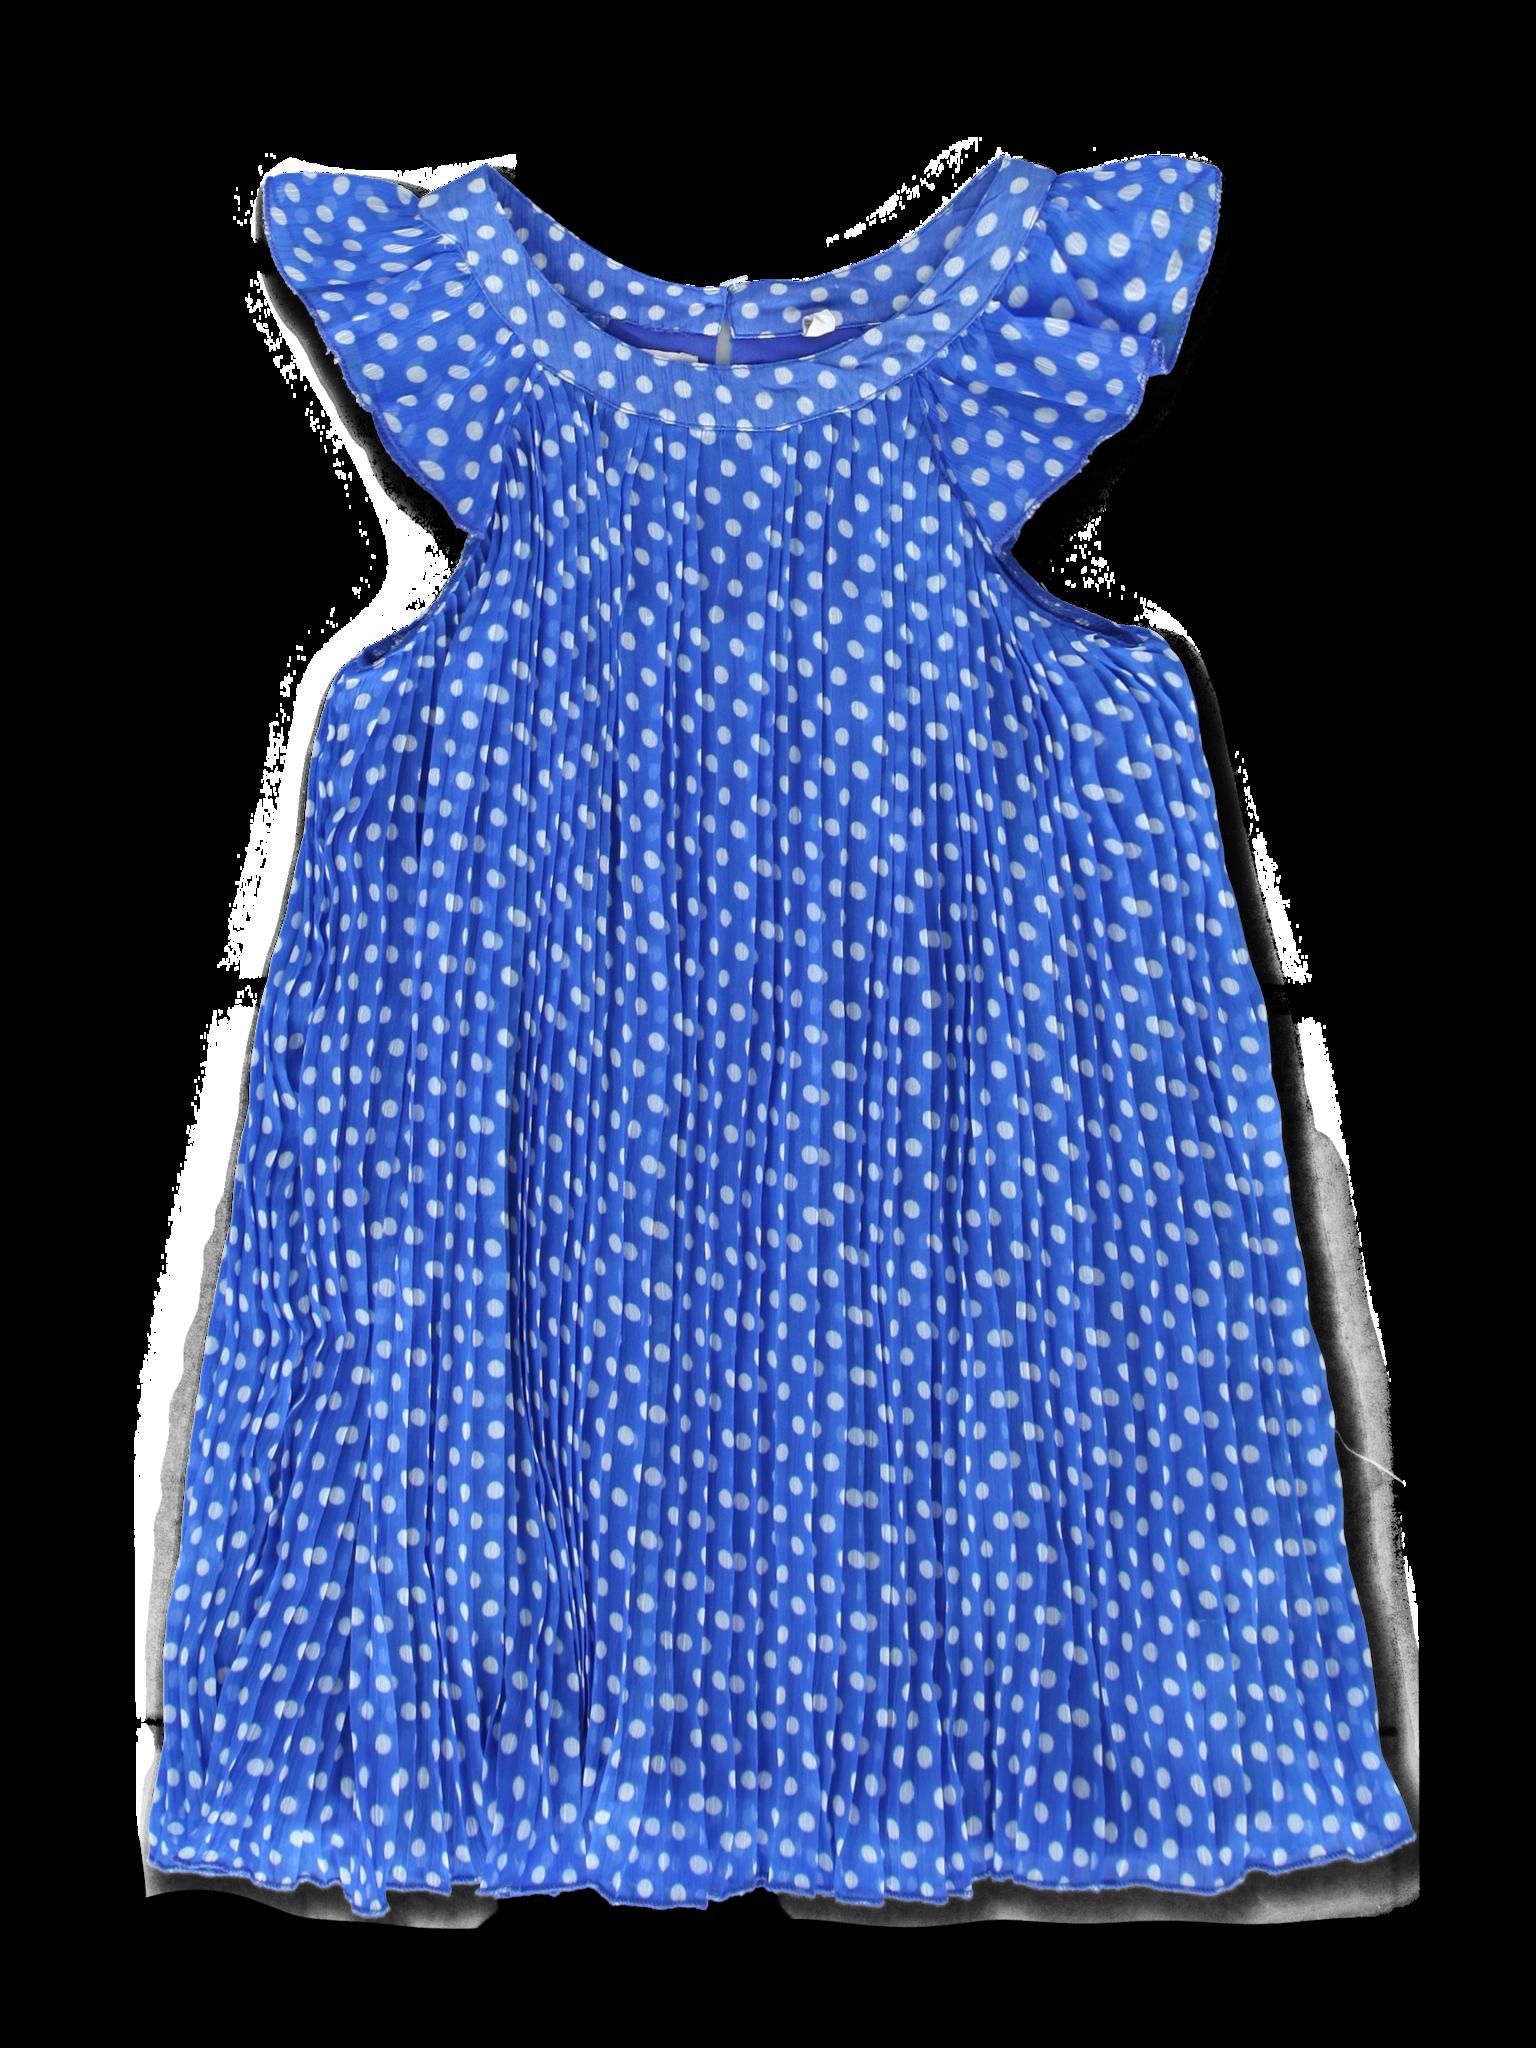 All Brands | Summerproducts Small Girls | Dress | 10 pcs/box